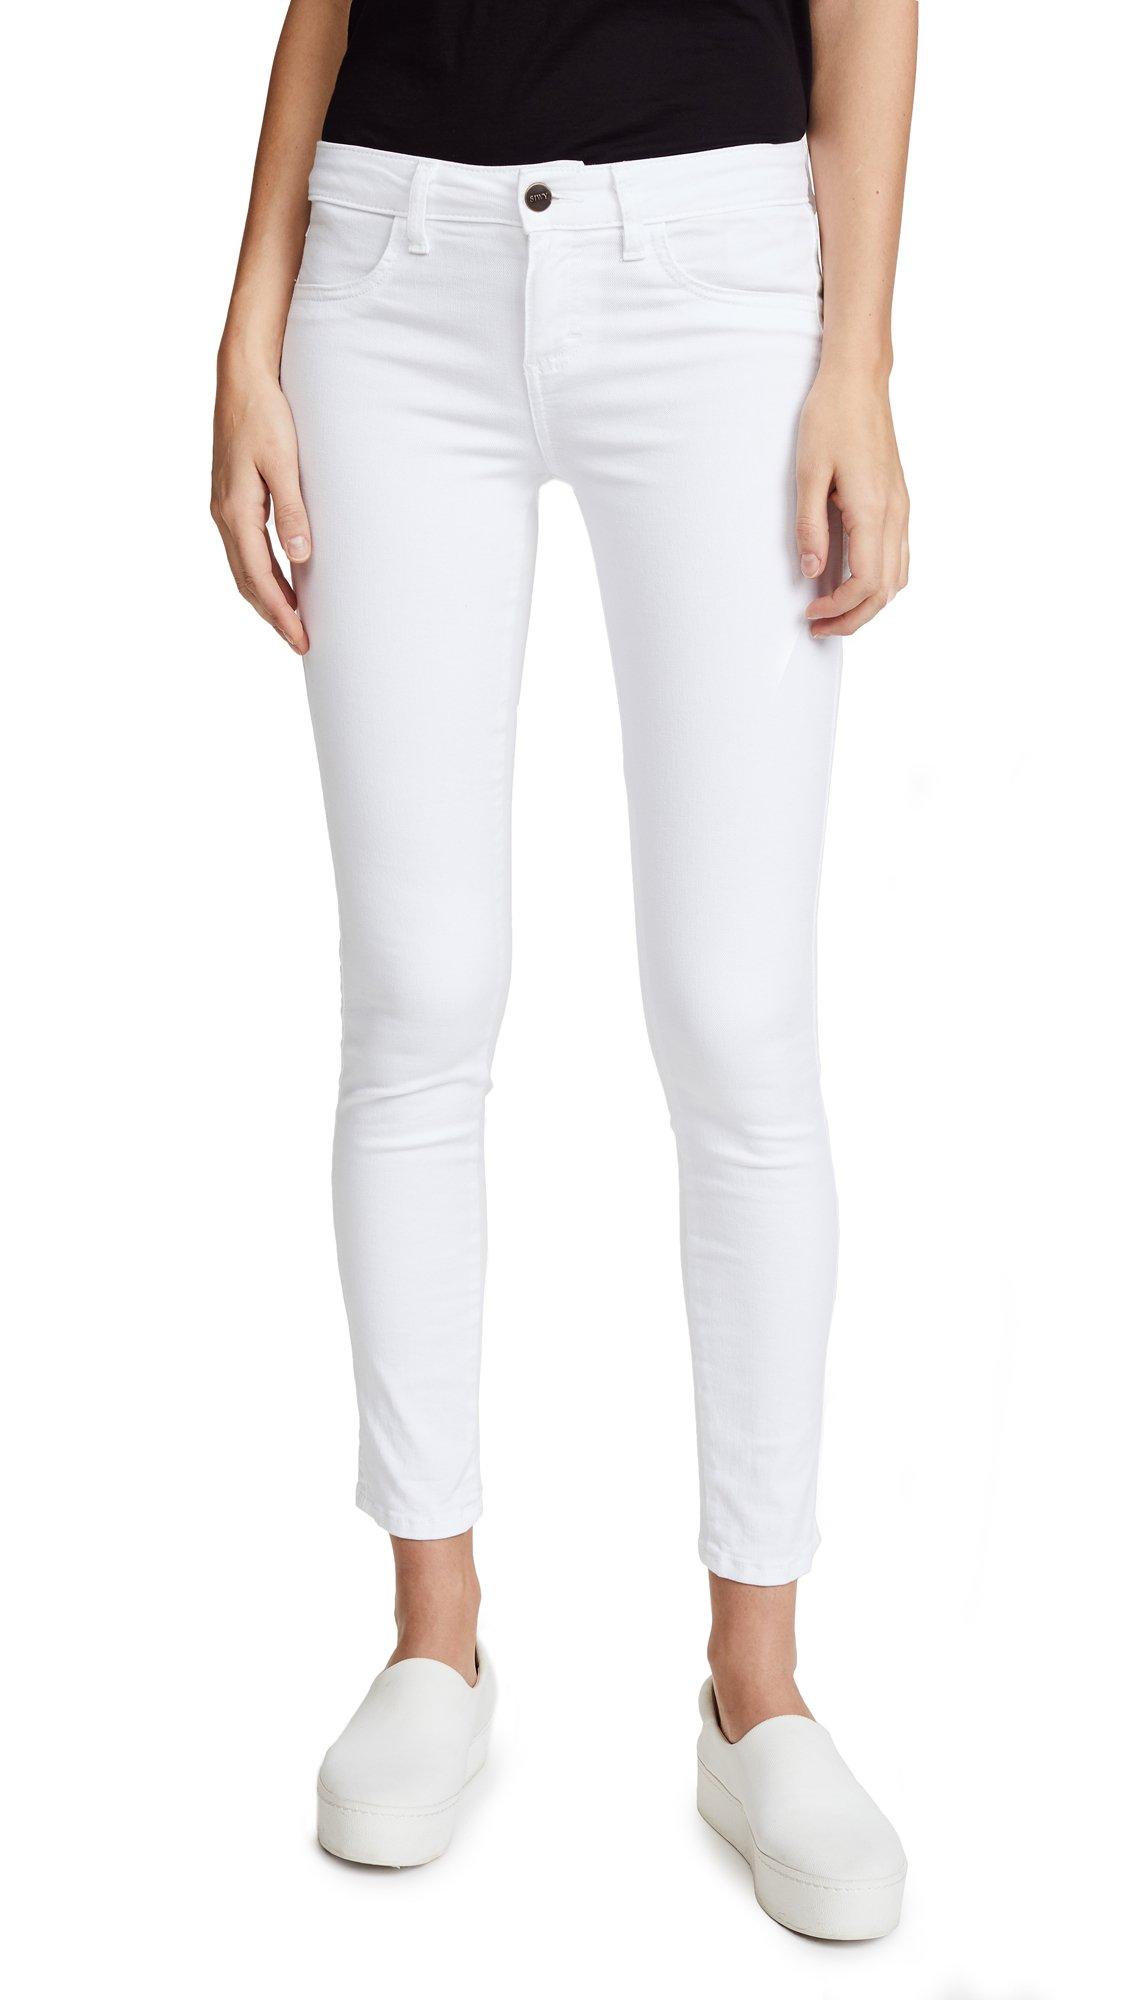 Siwy Hannah In Love Spell Jeans